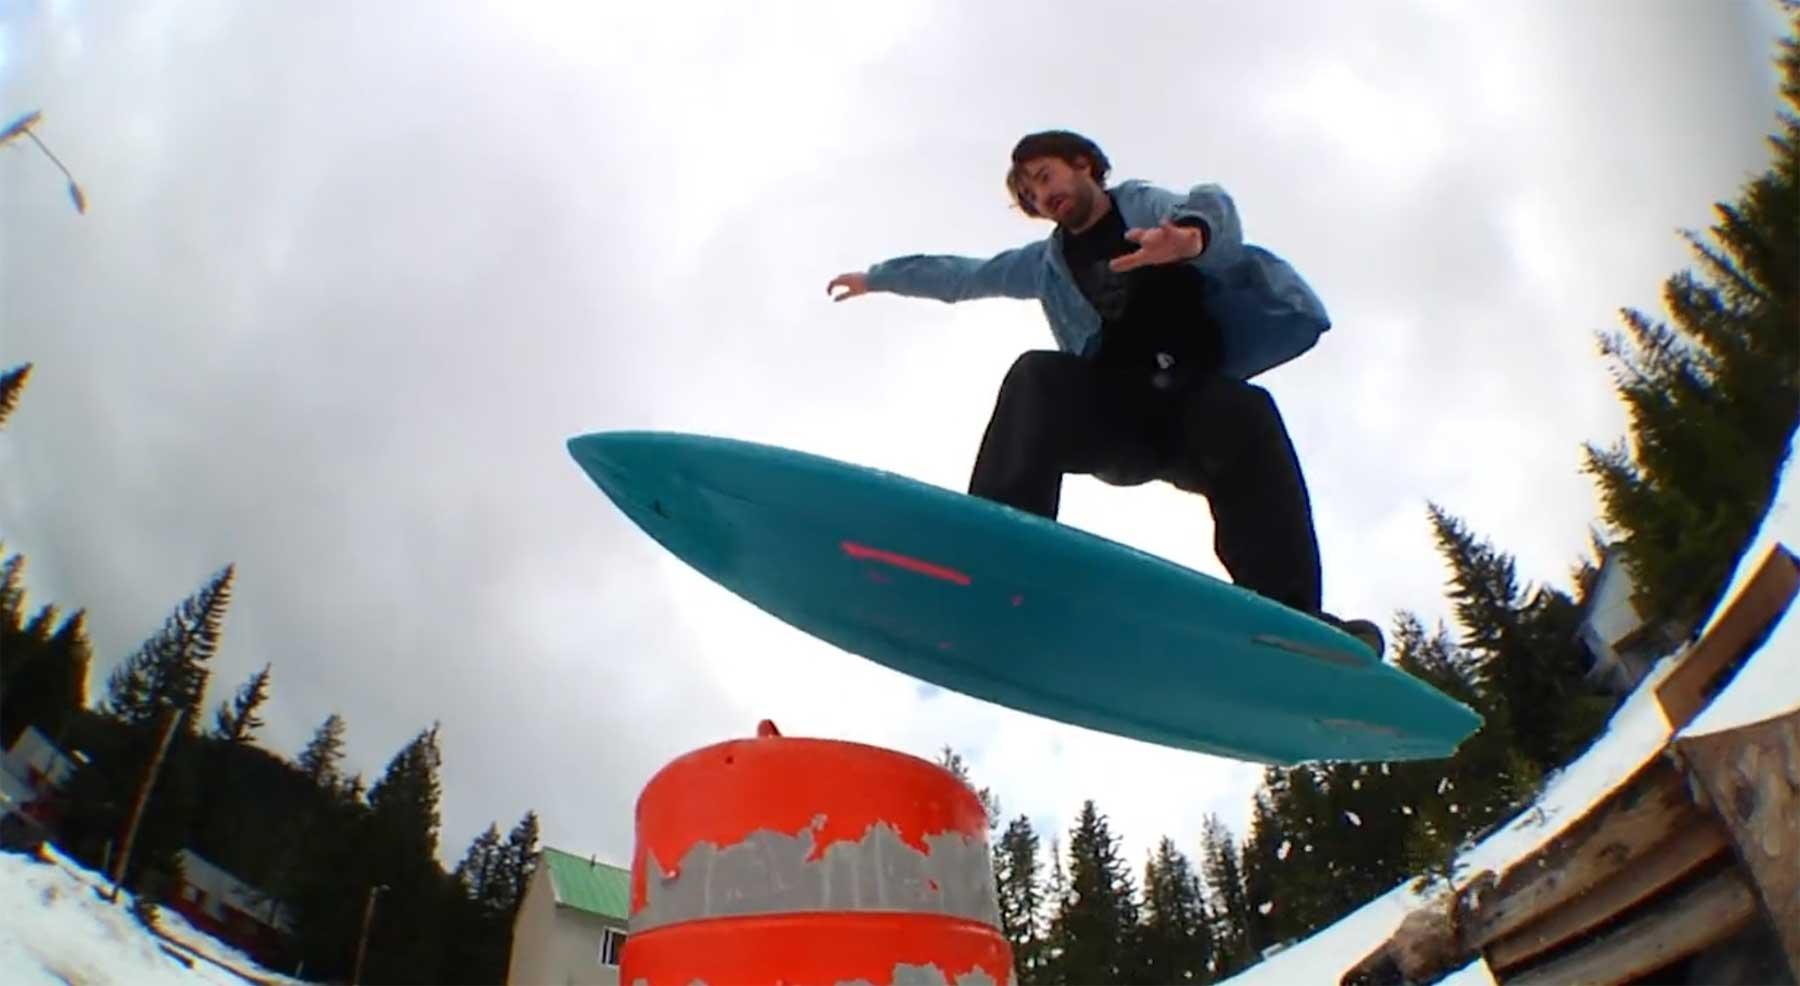 Spontane Snowboard-Sause: FSBS2 FSBS2-snowboarding